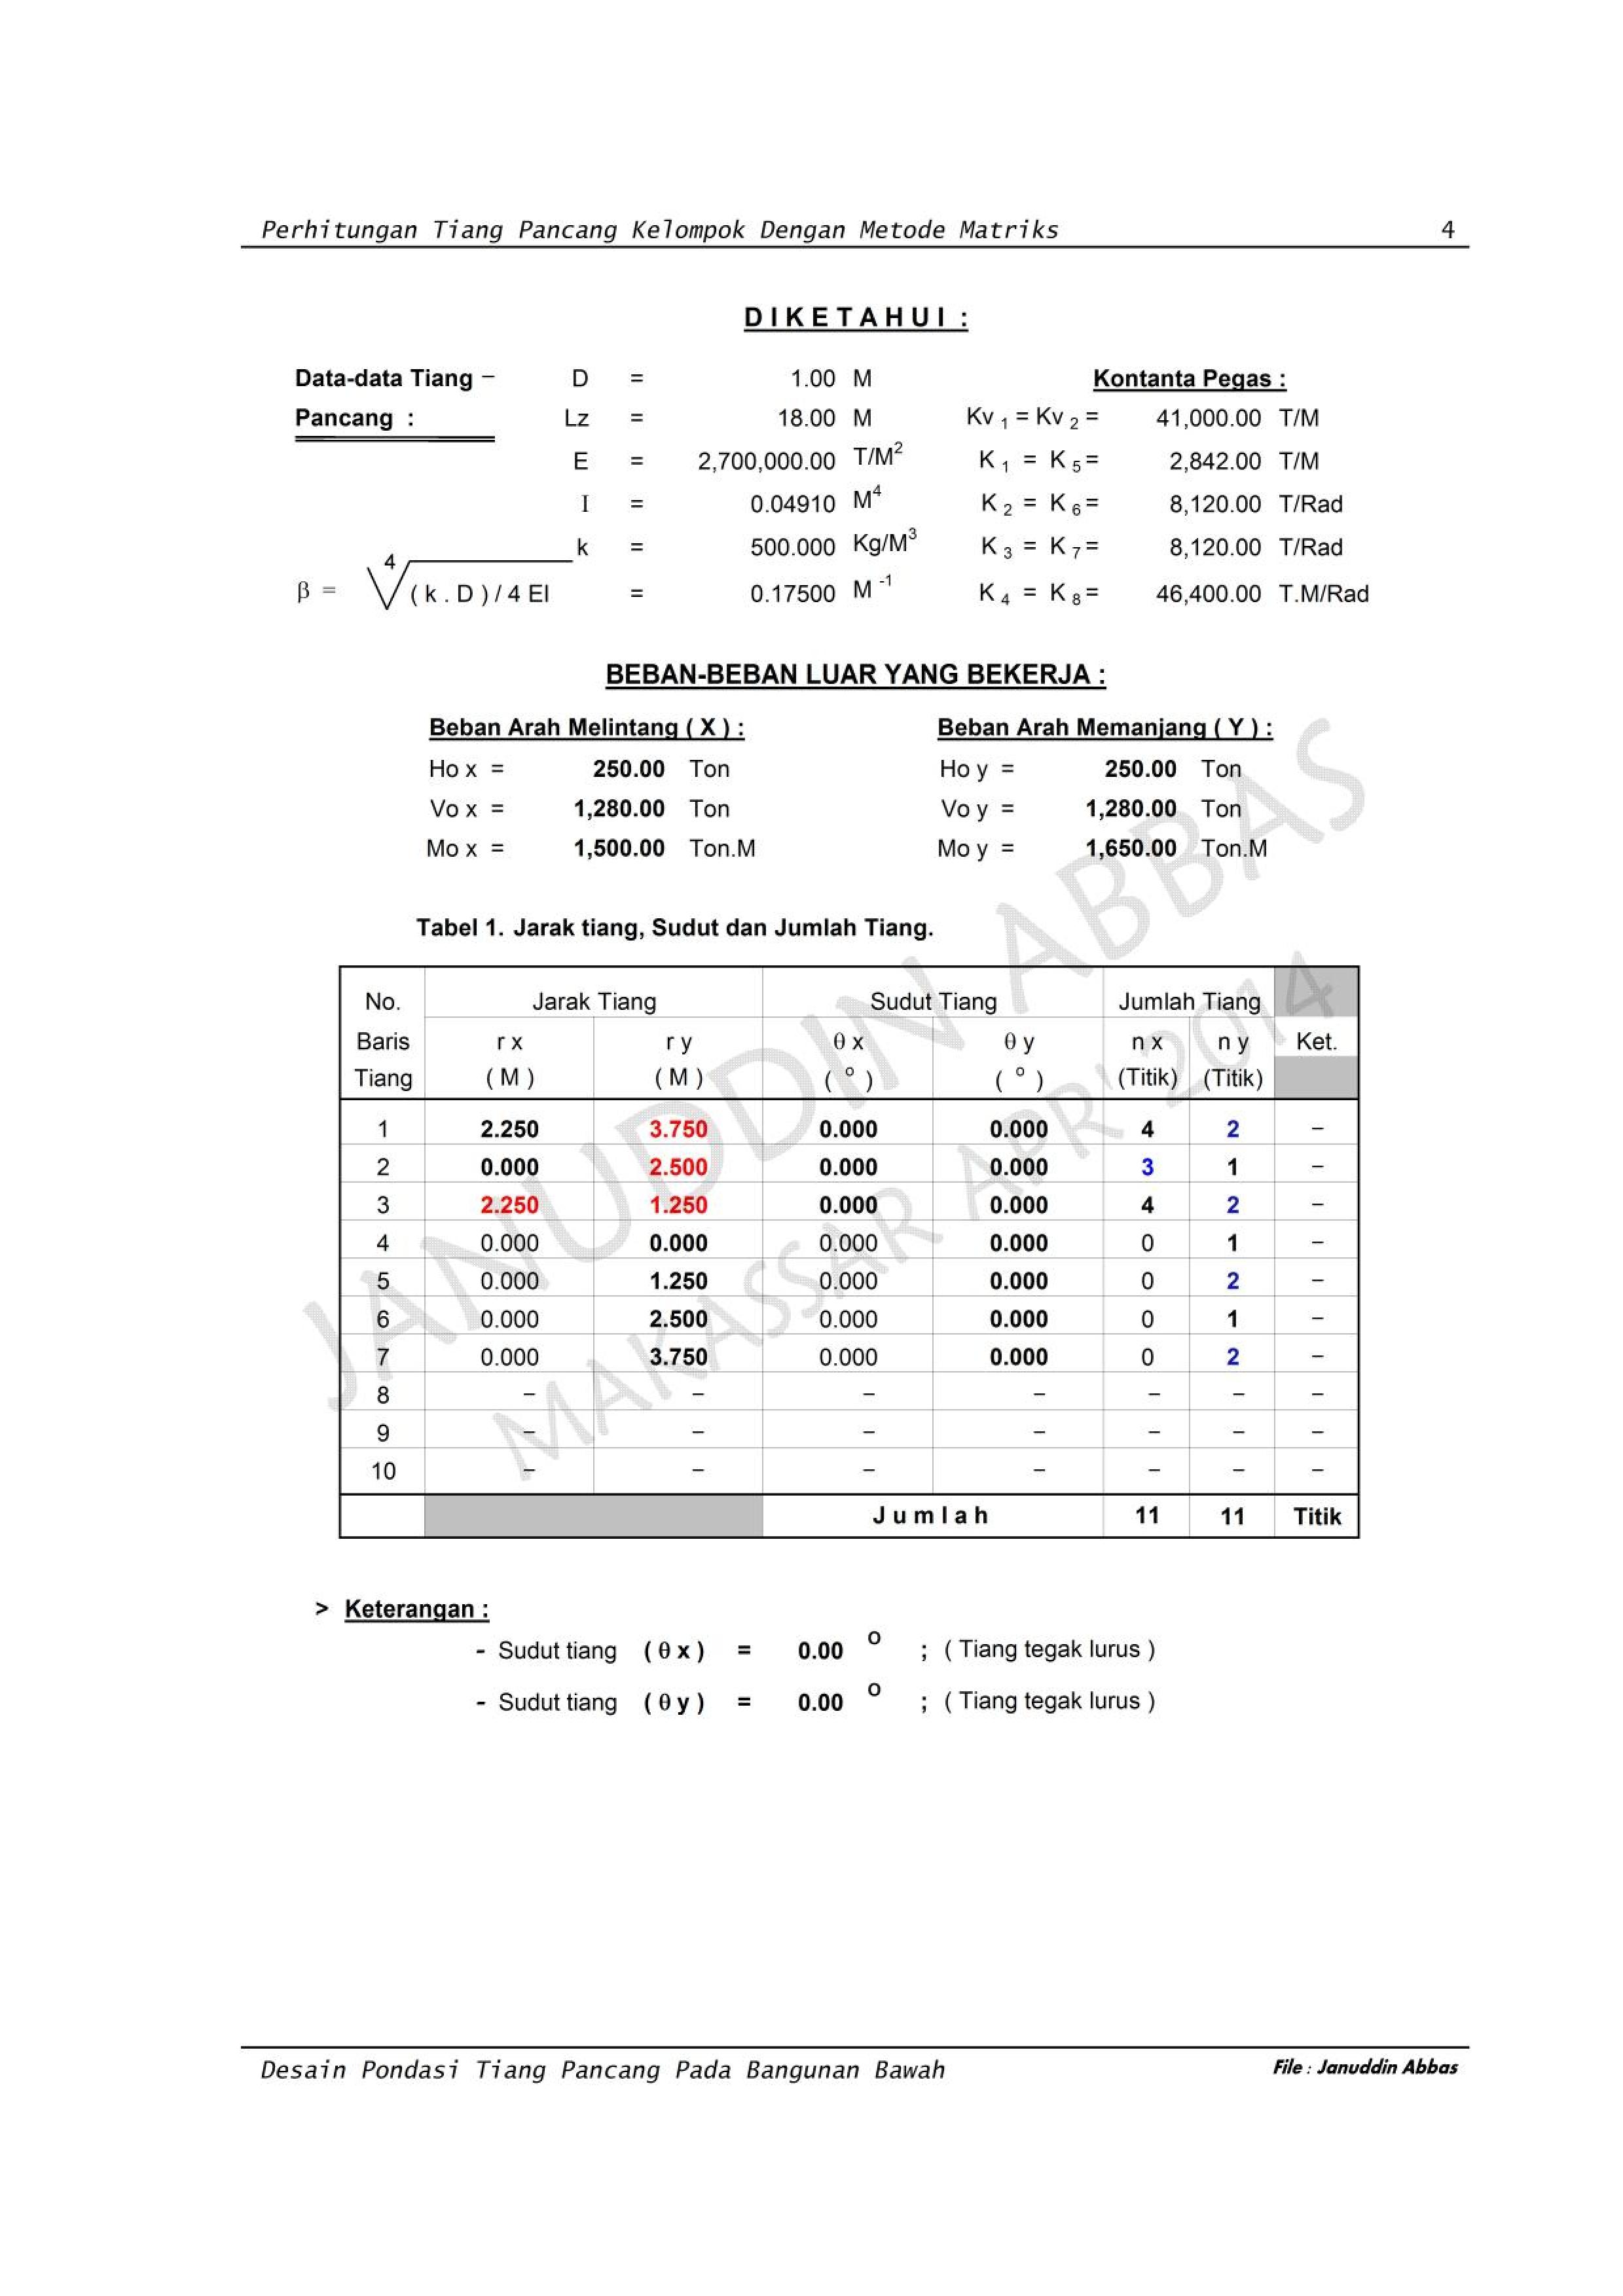 Perh. T. Pancang Dgn. Metode Matrix_006